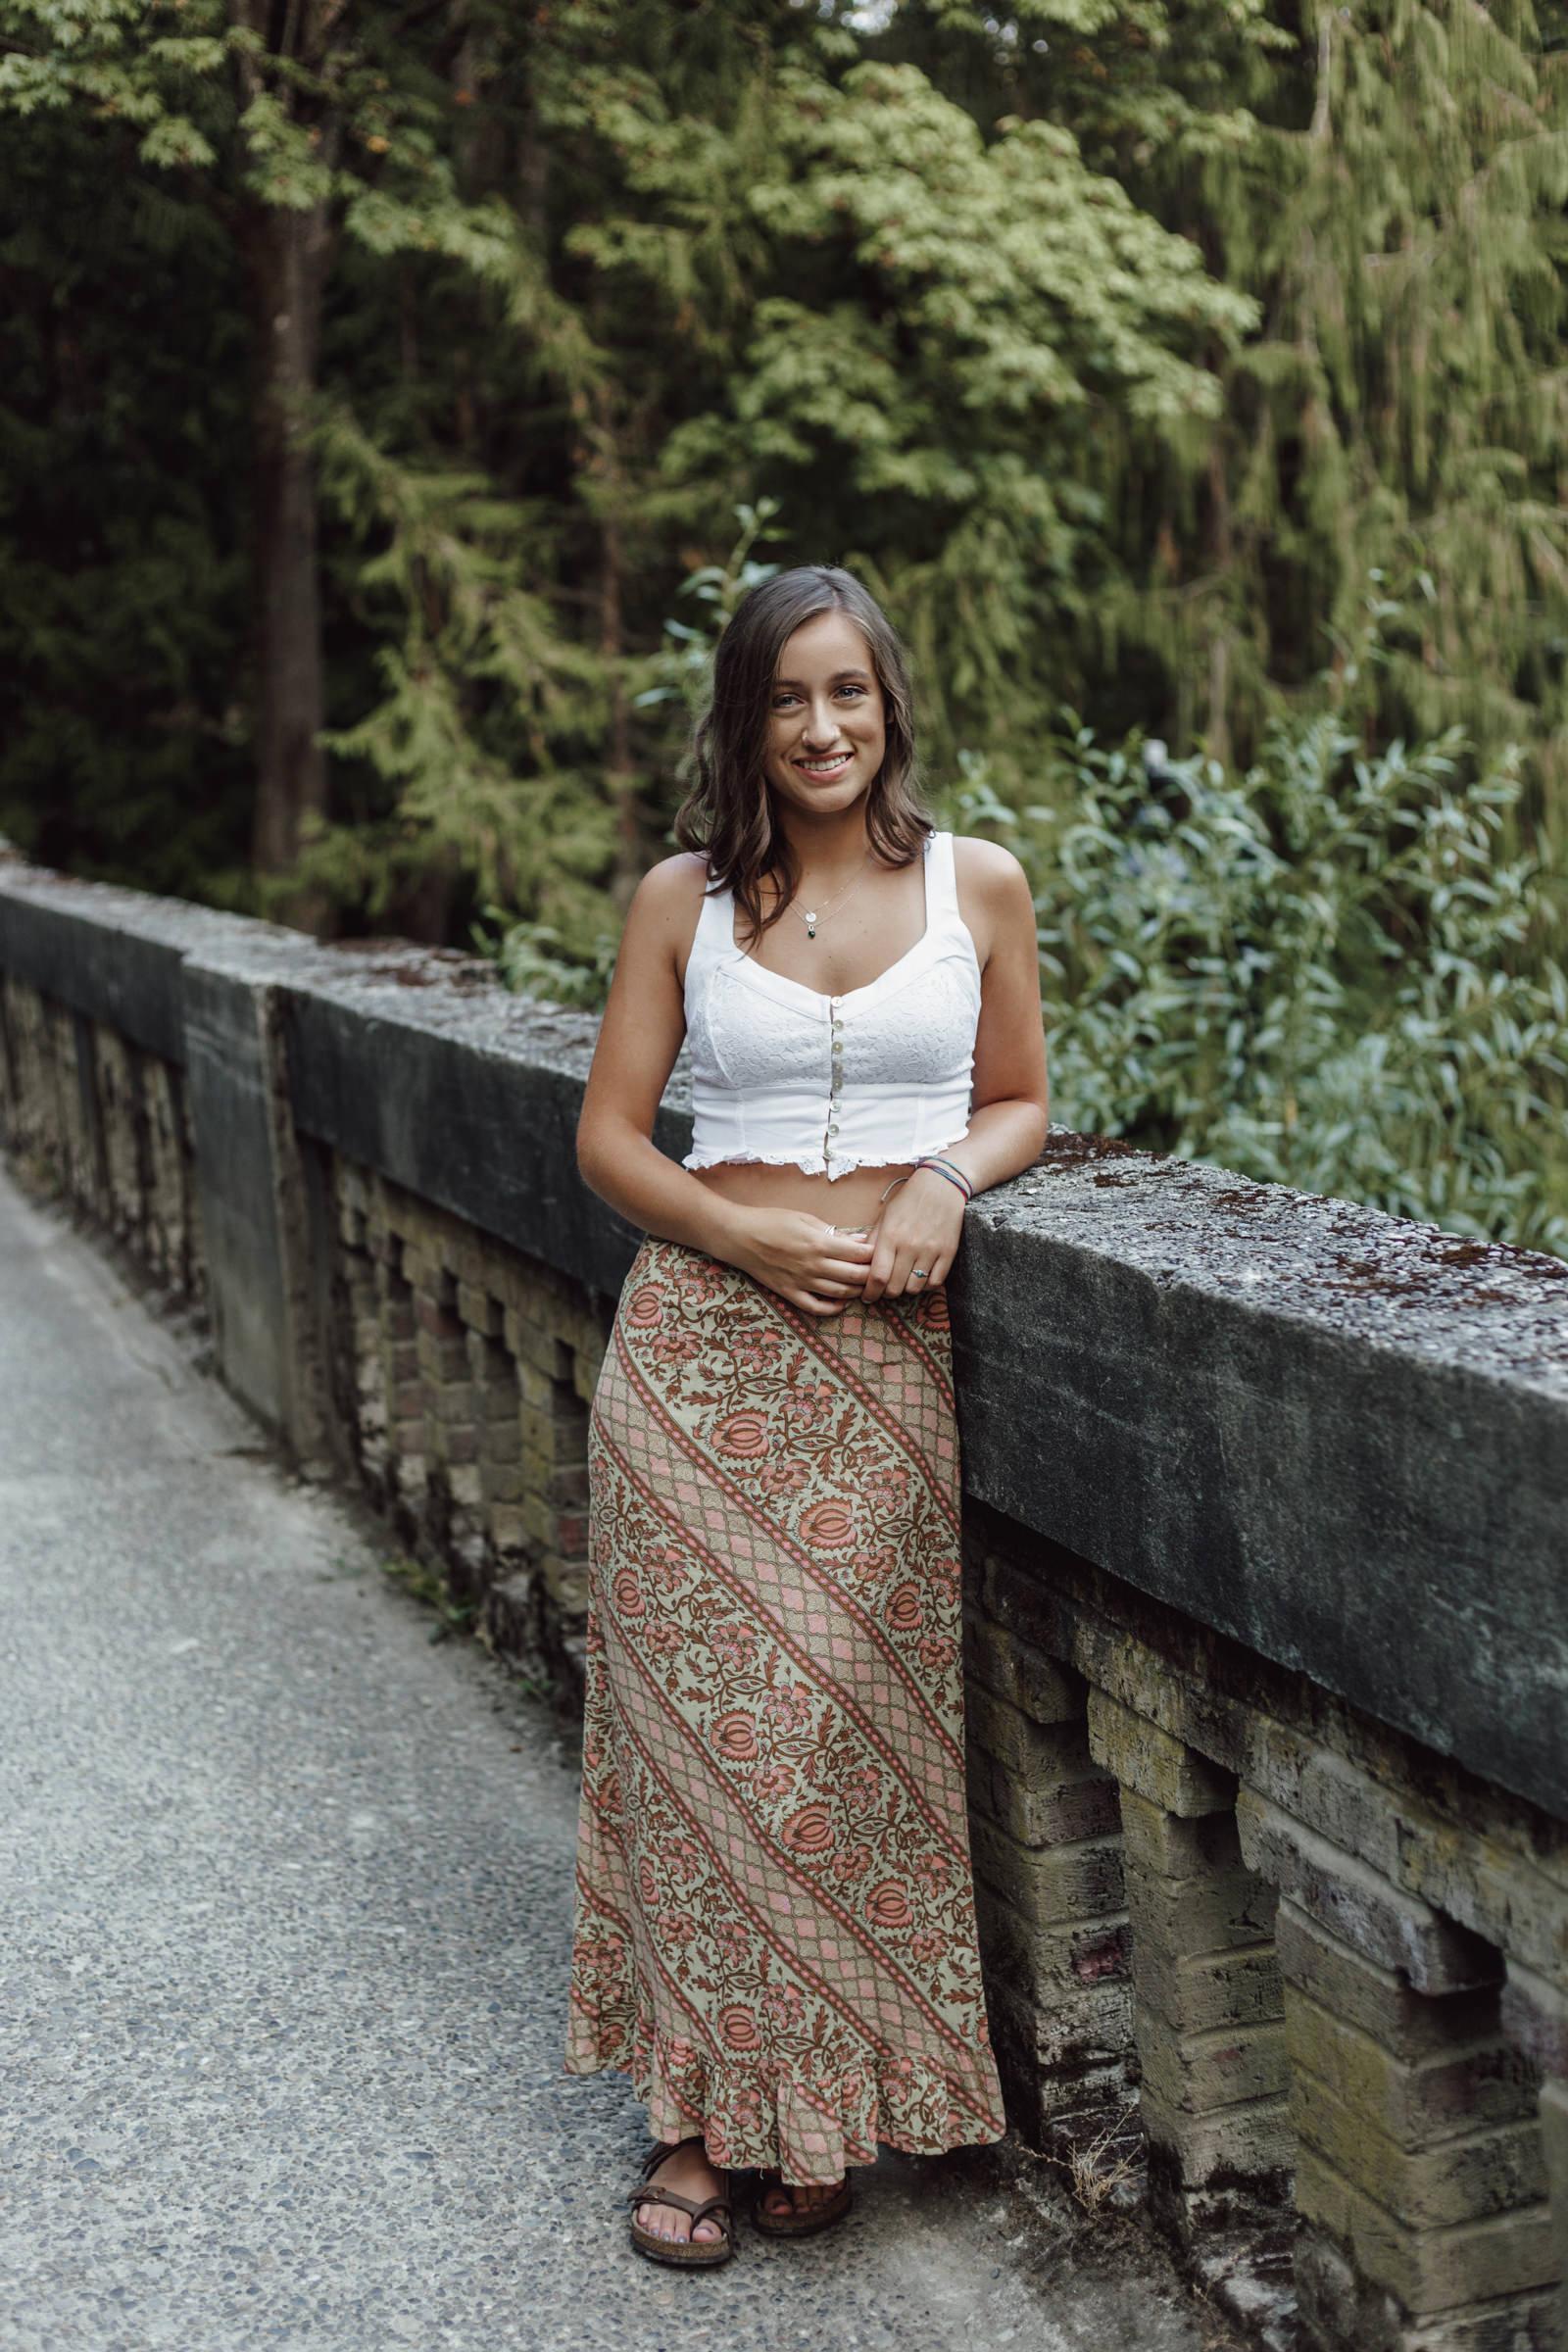 MeganSeniorPortraits-HaleyMcLainPhotography-2.JPG